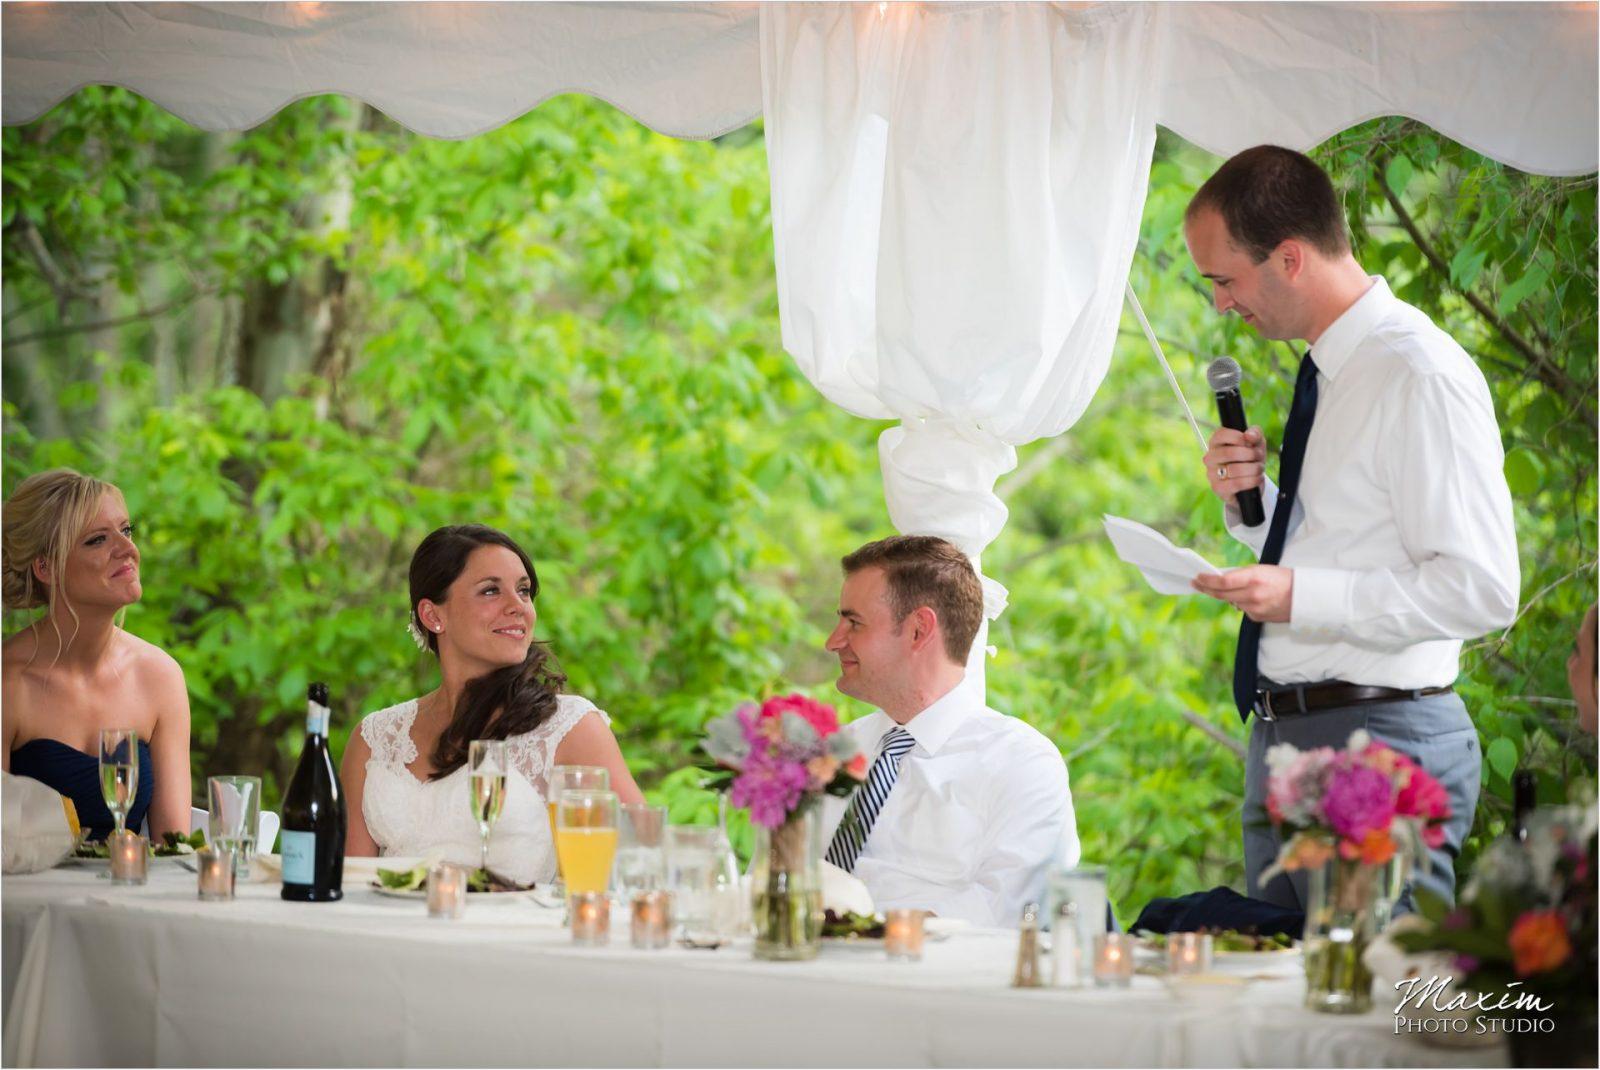 Potato Hill Farm Wedding Reception Toasts